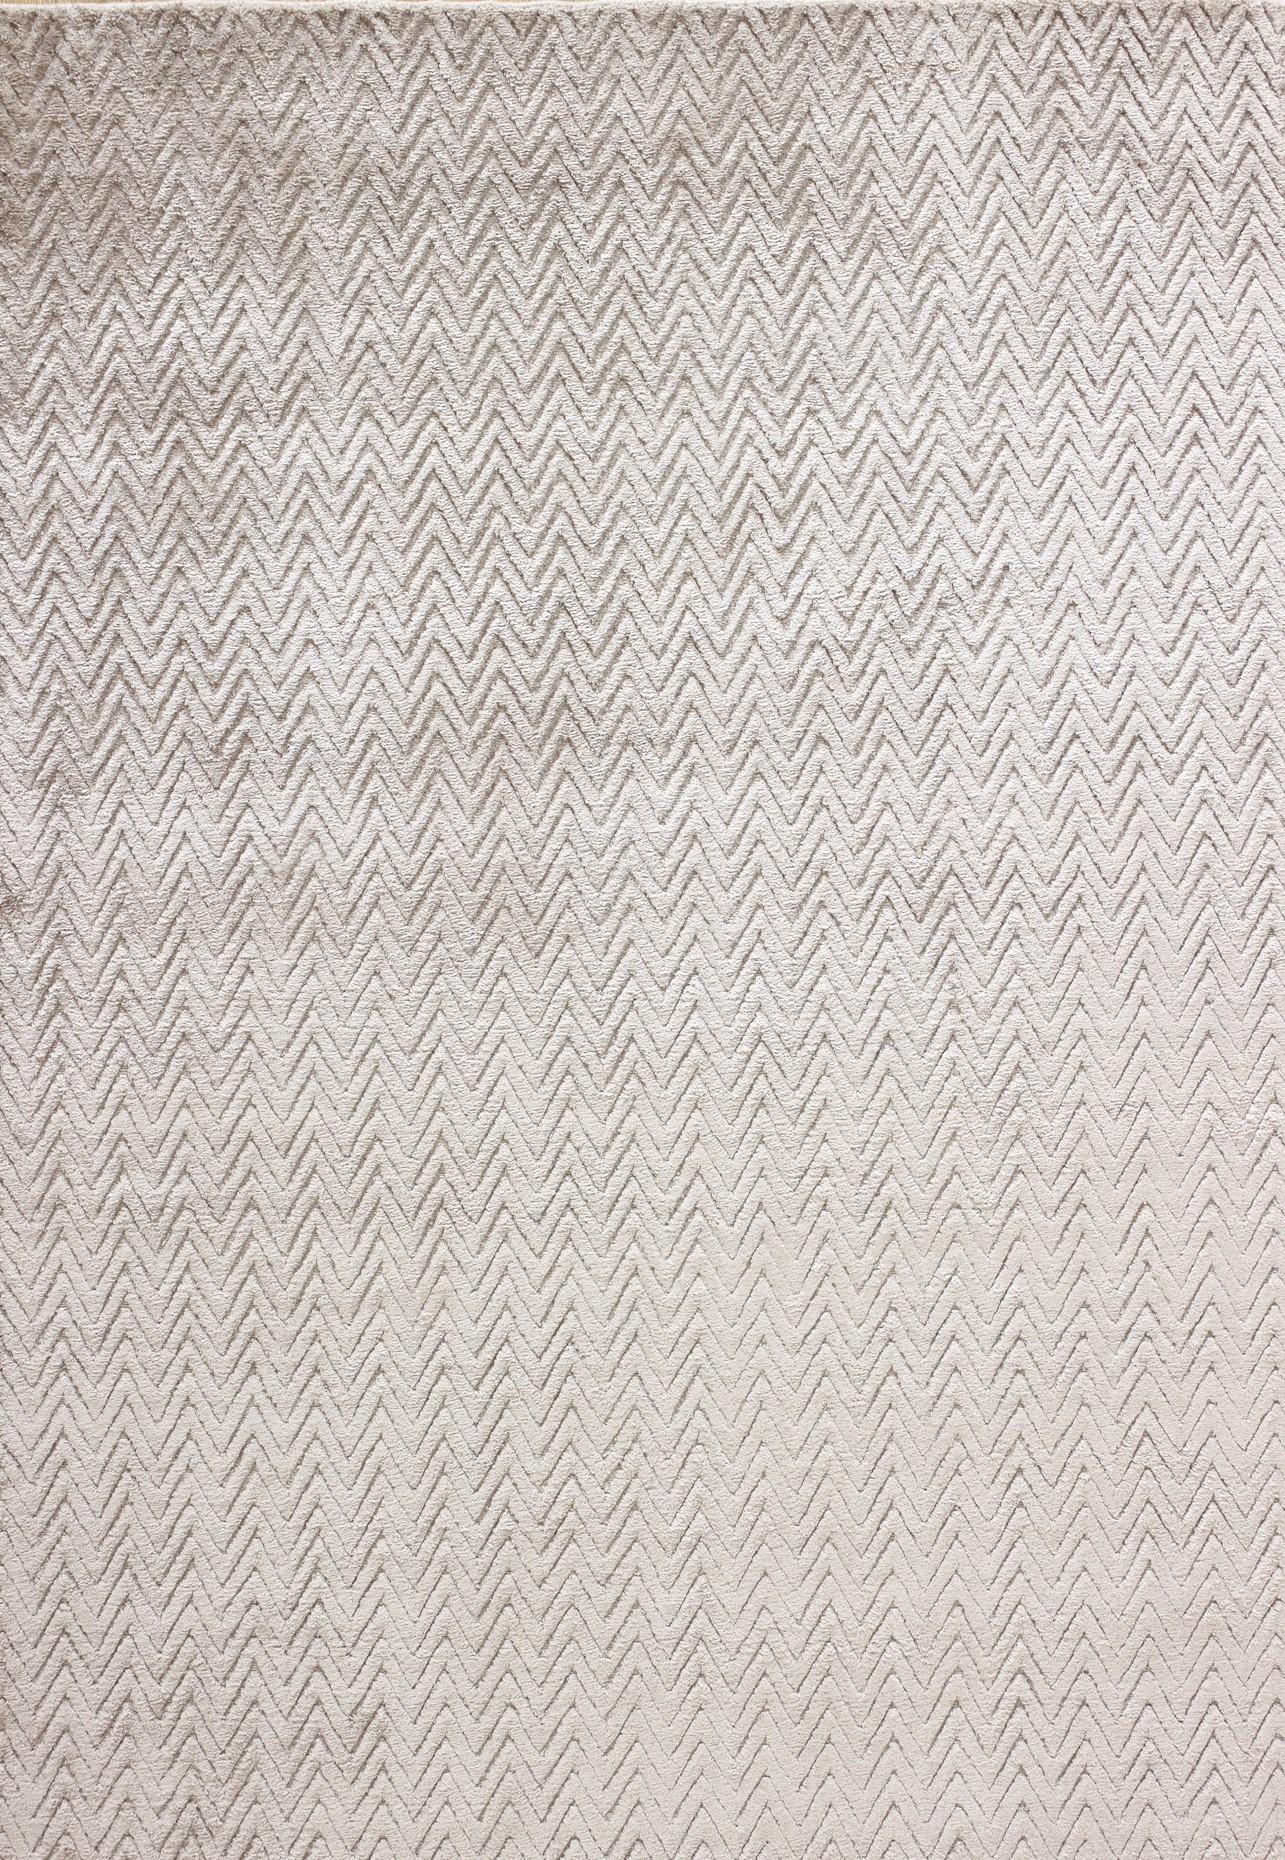 Peaks Handloom Rug (Colour: Silver, Rug Size: 160 x 230)